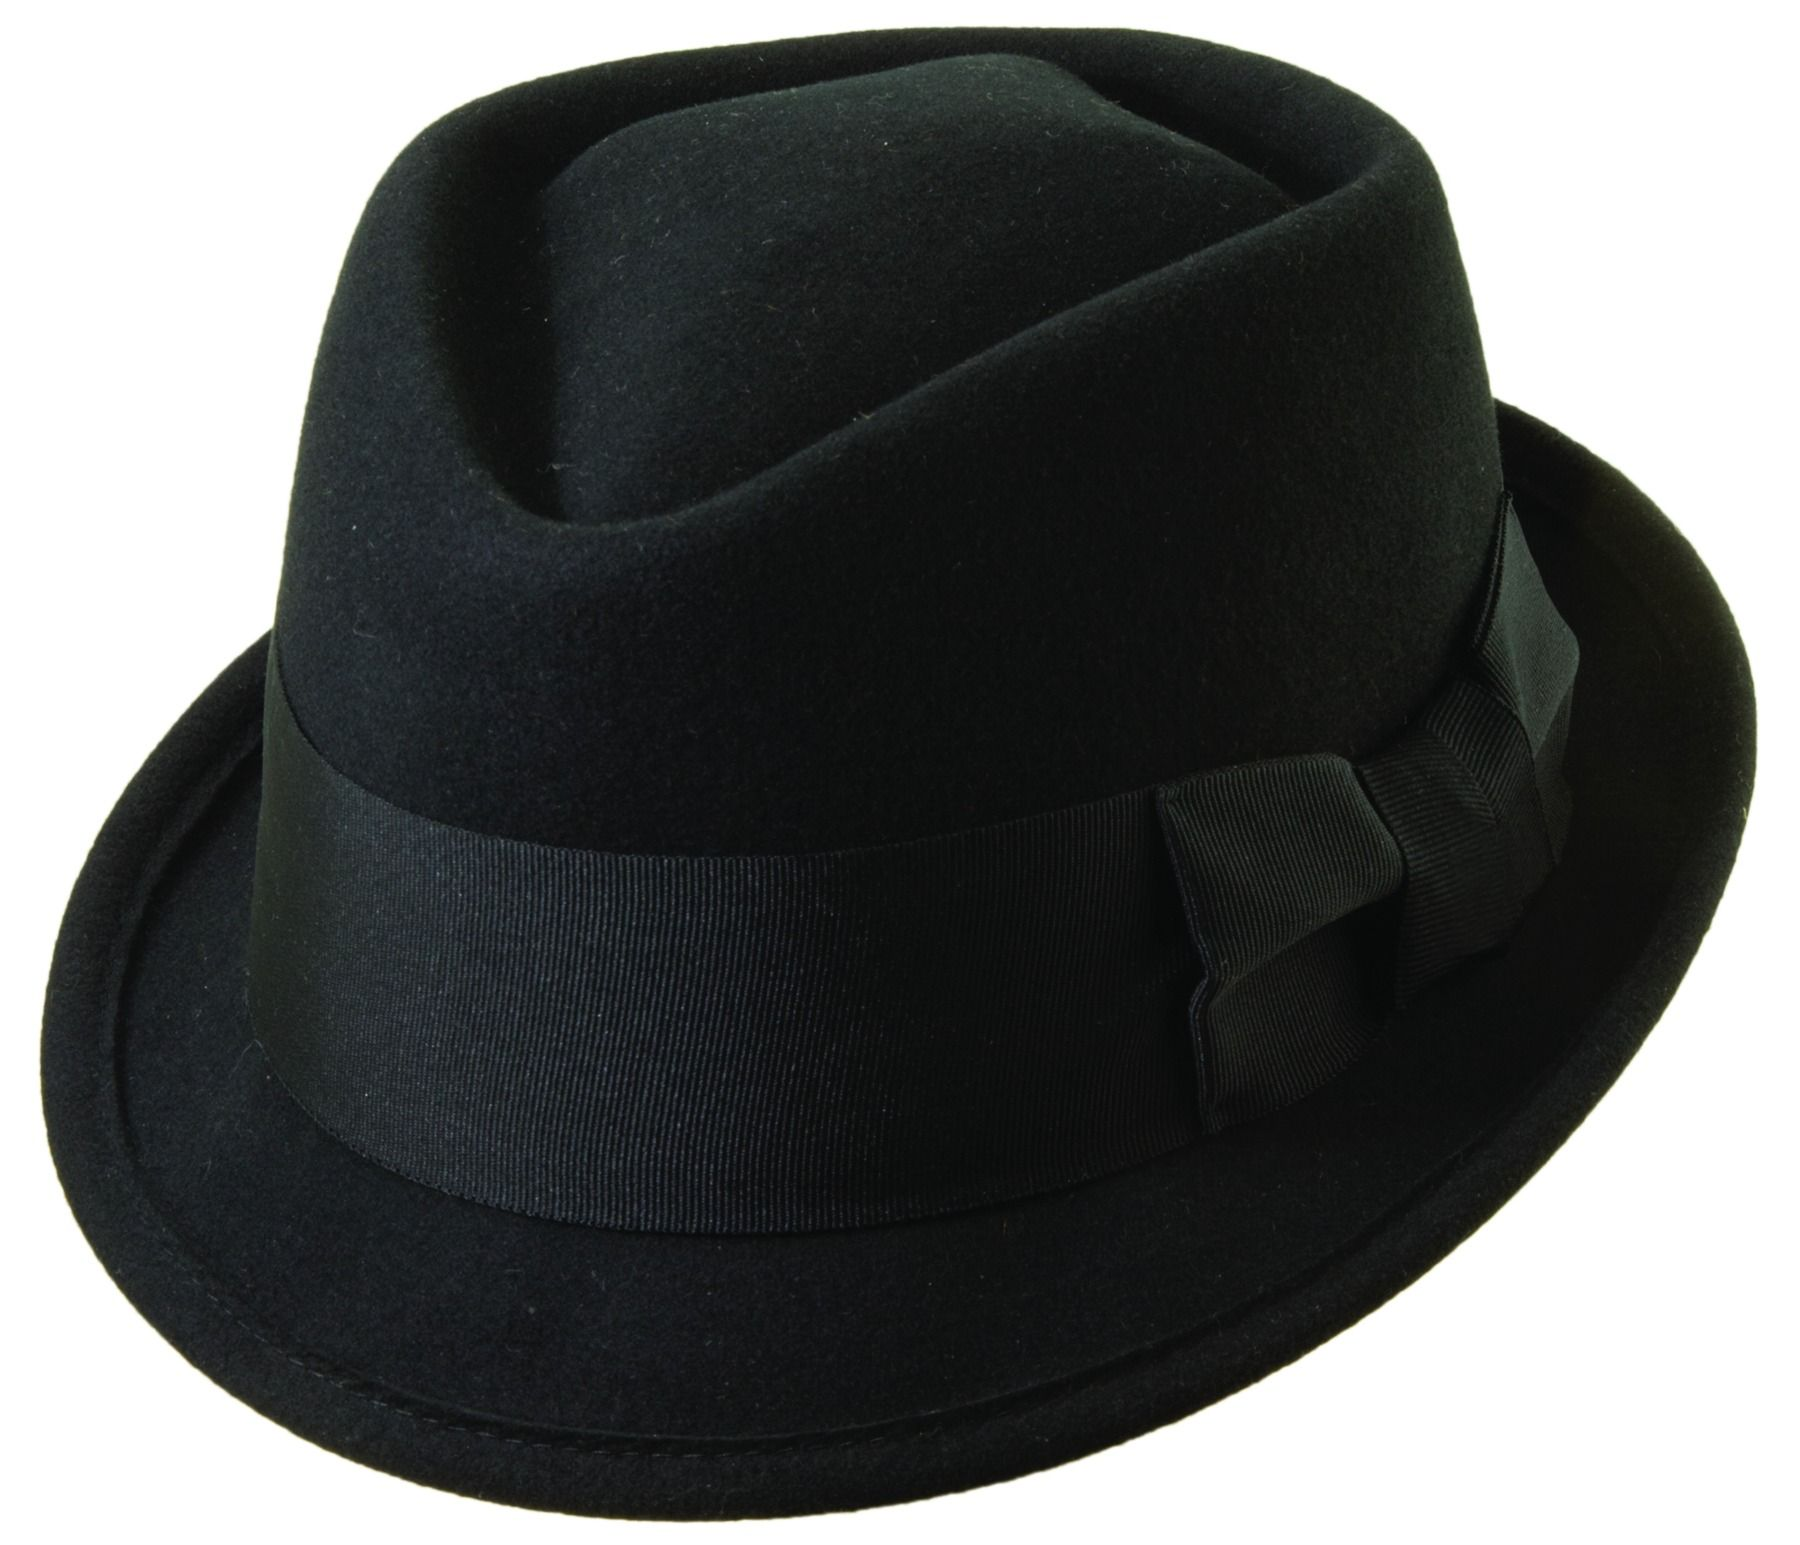 34d5fd2346a85f Frank Sinatra The Way You Look Tonight Fedora | My Style | Dress ...